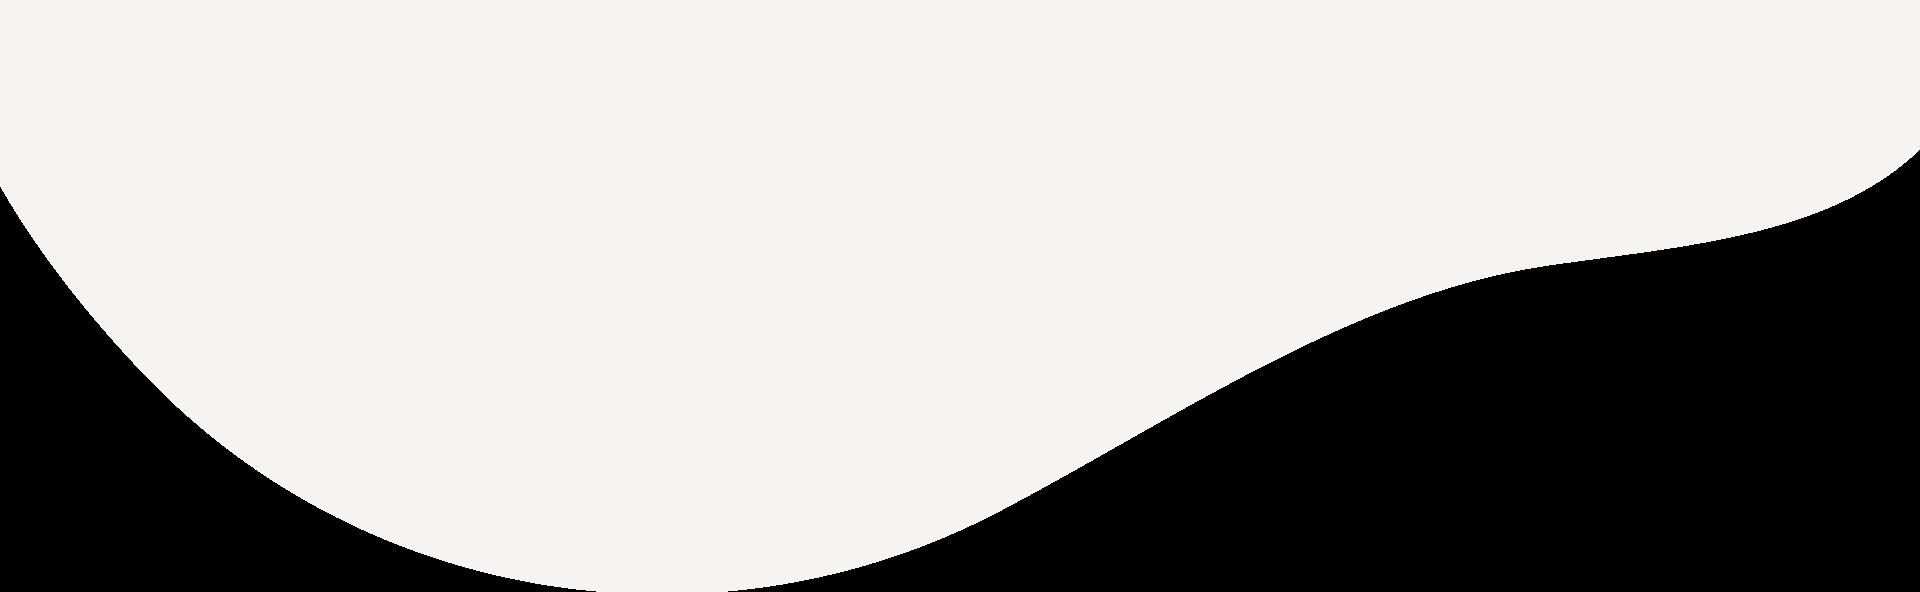 employee-banner-bg.png